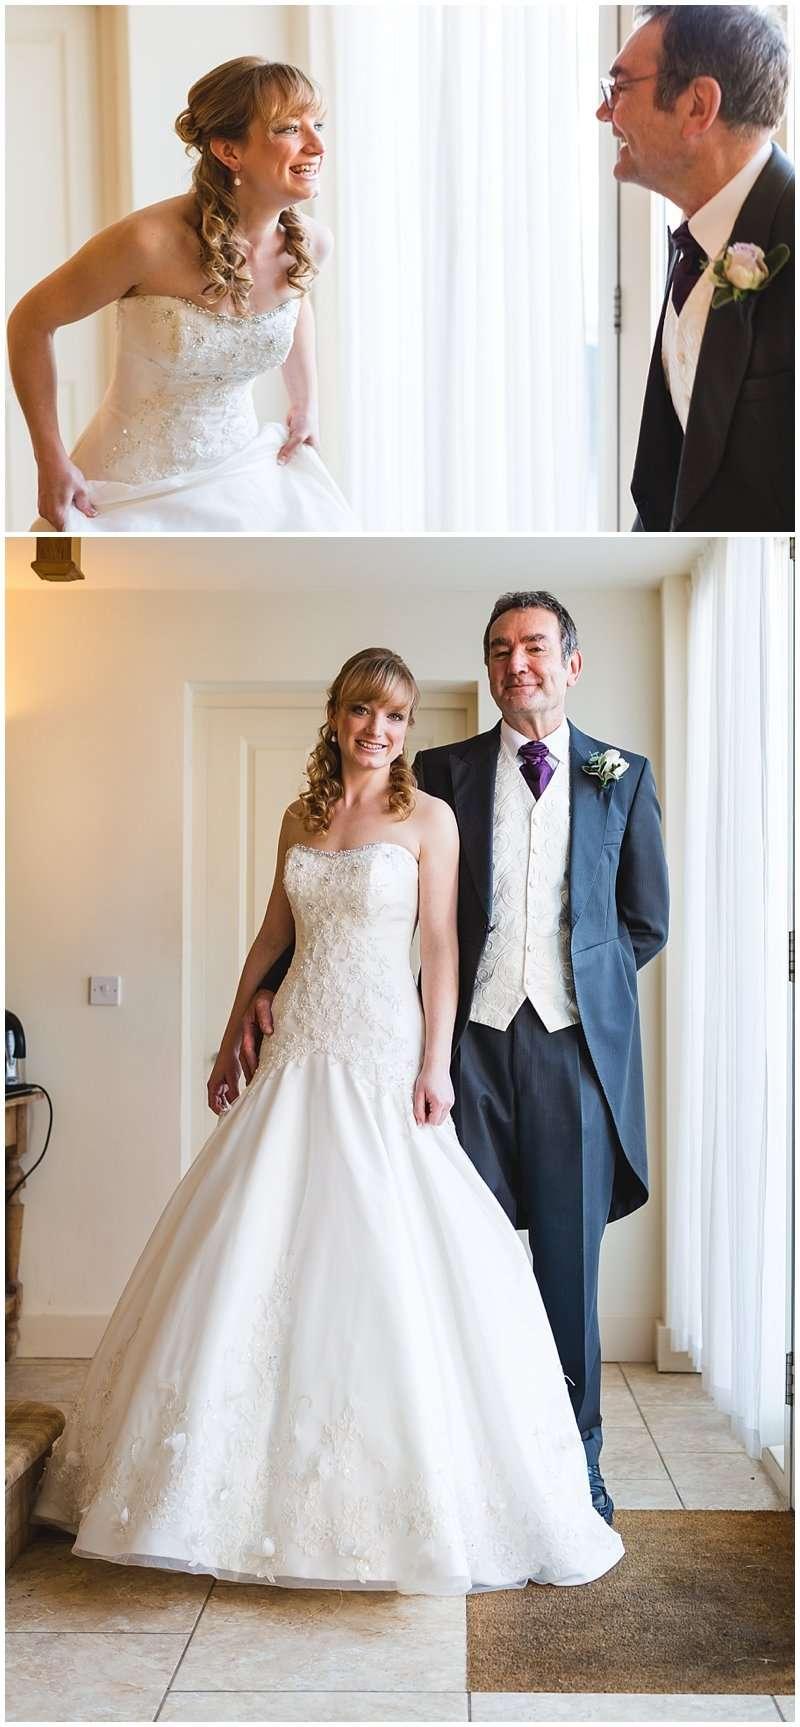 JEN AND MARCUS ELMS BARN WEDDING - NORFOLK WEDDING PHOTOGRAPHER 18